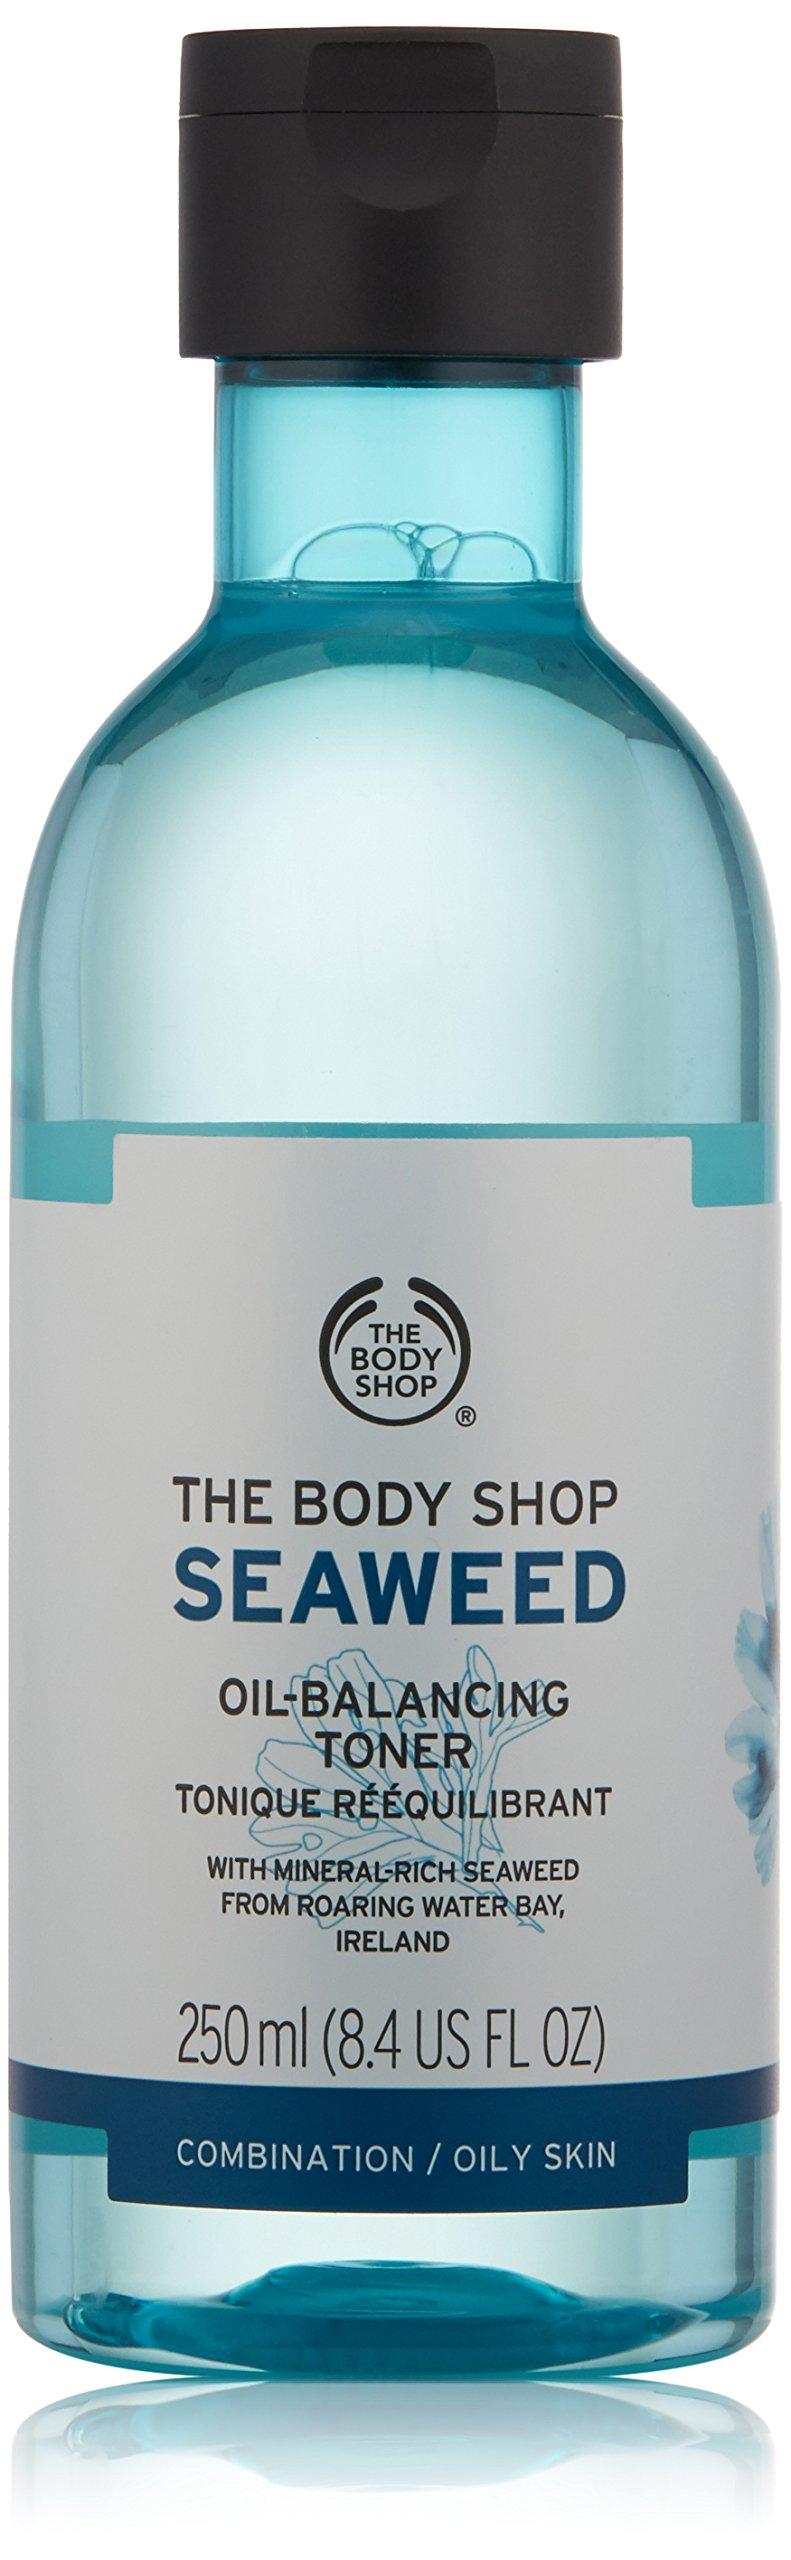 the body shop seaweed oil balancing toner review